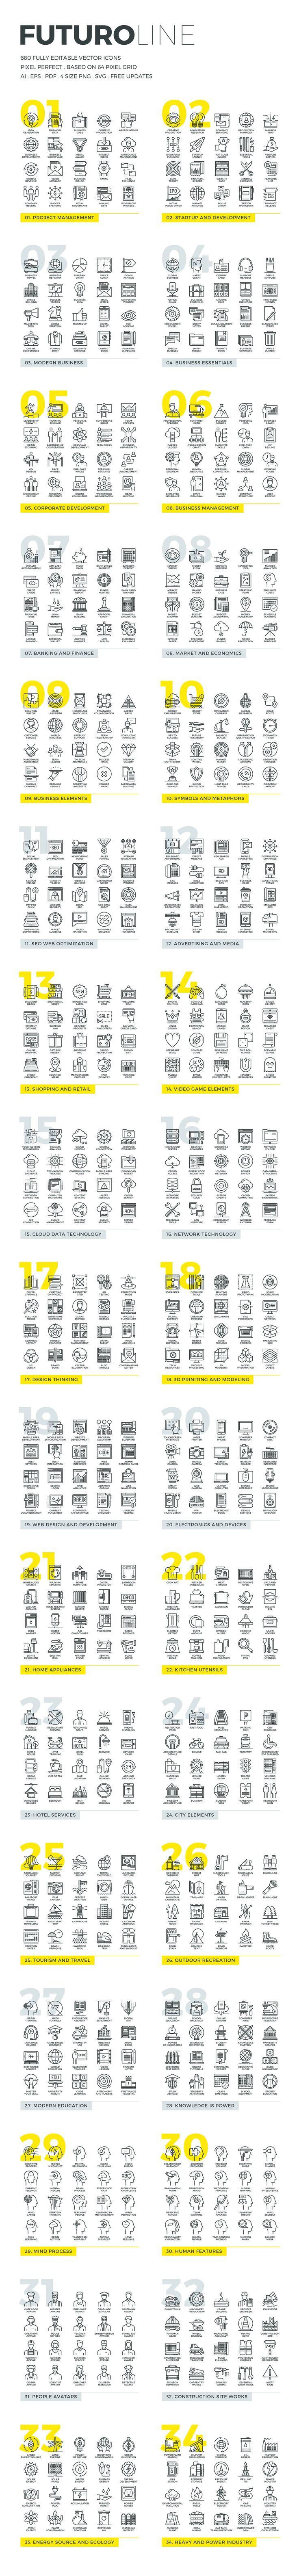 Futuro Line Icons by Bloomua on Creative Market